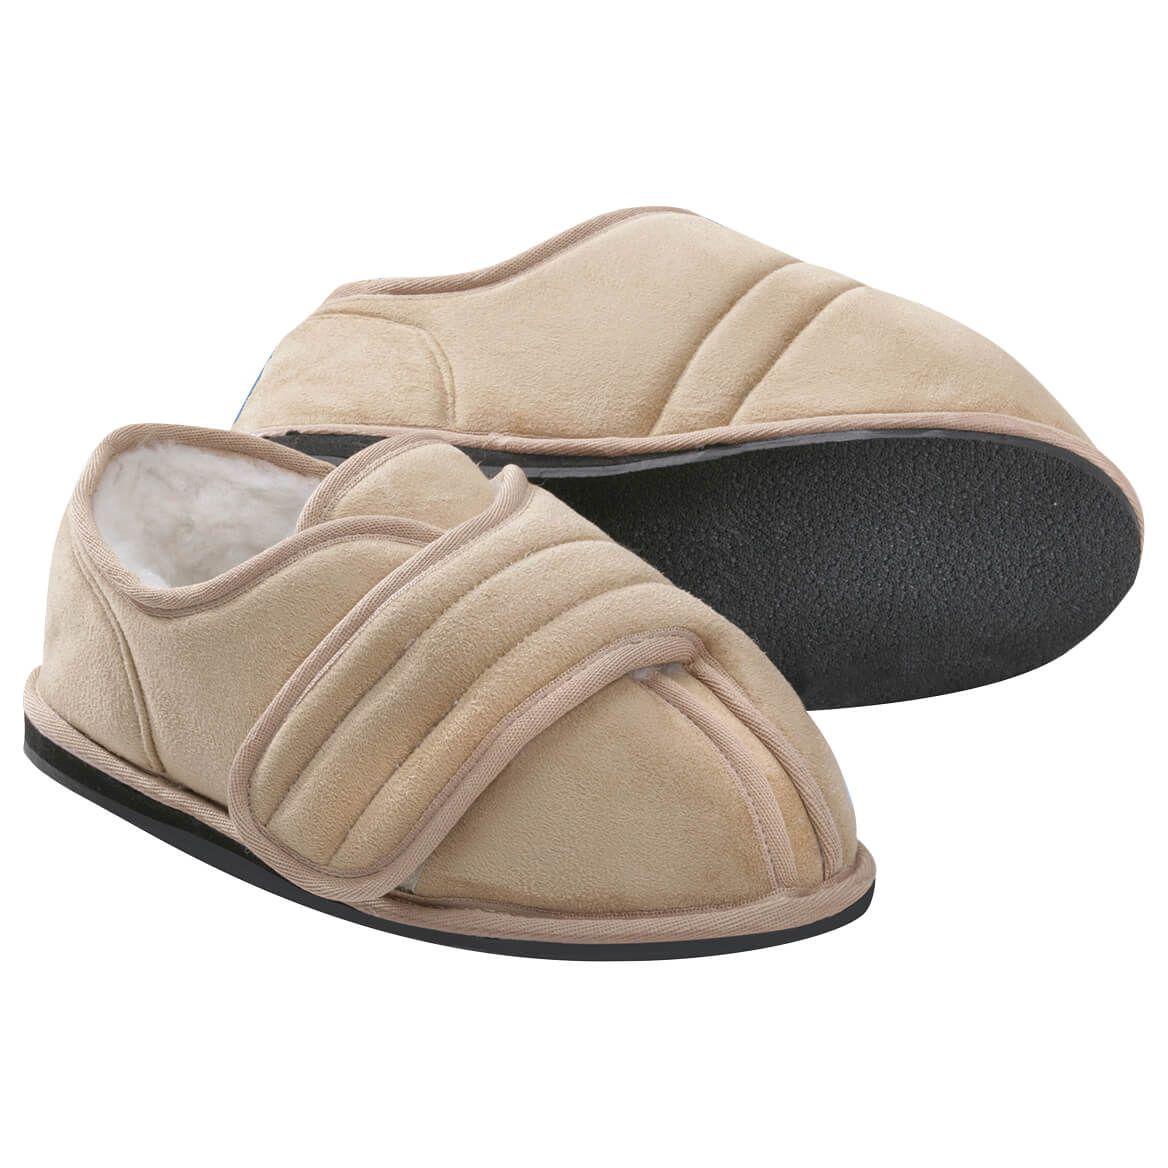 Year Round Comfort Slippers Ladies-370154